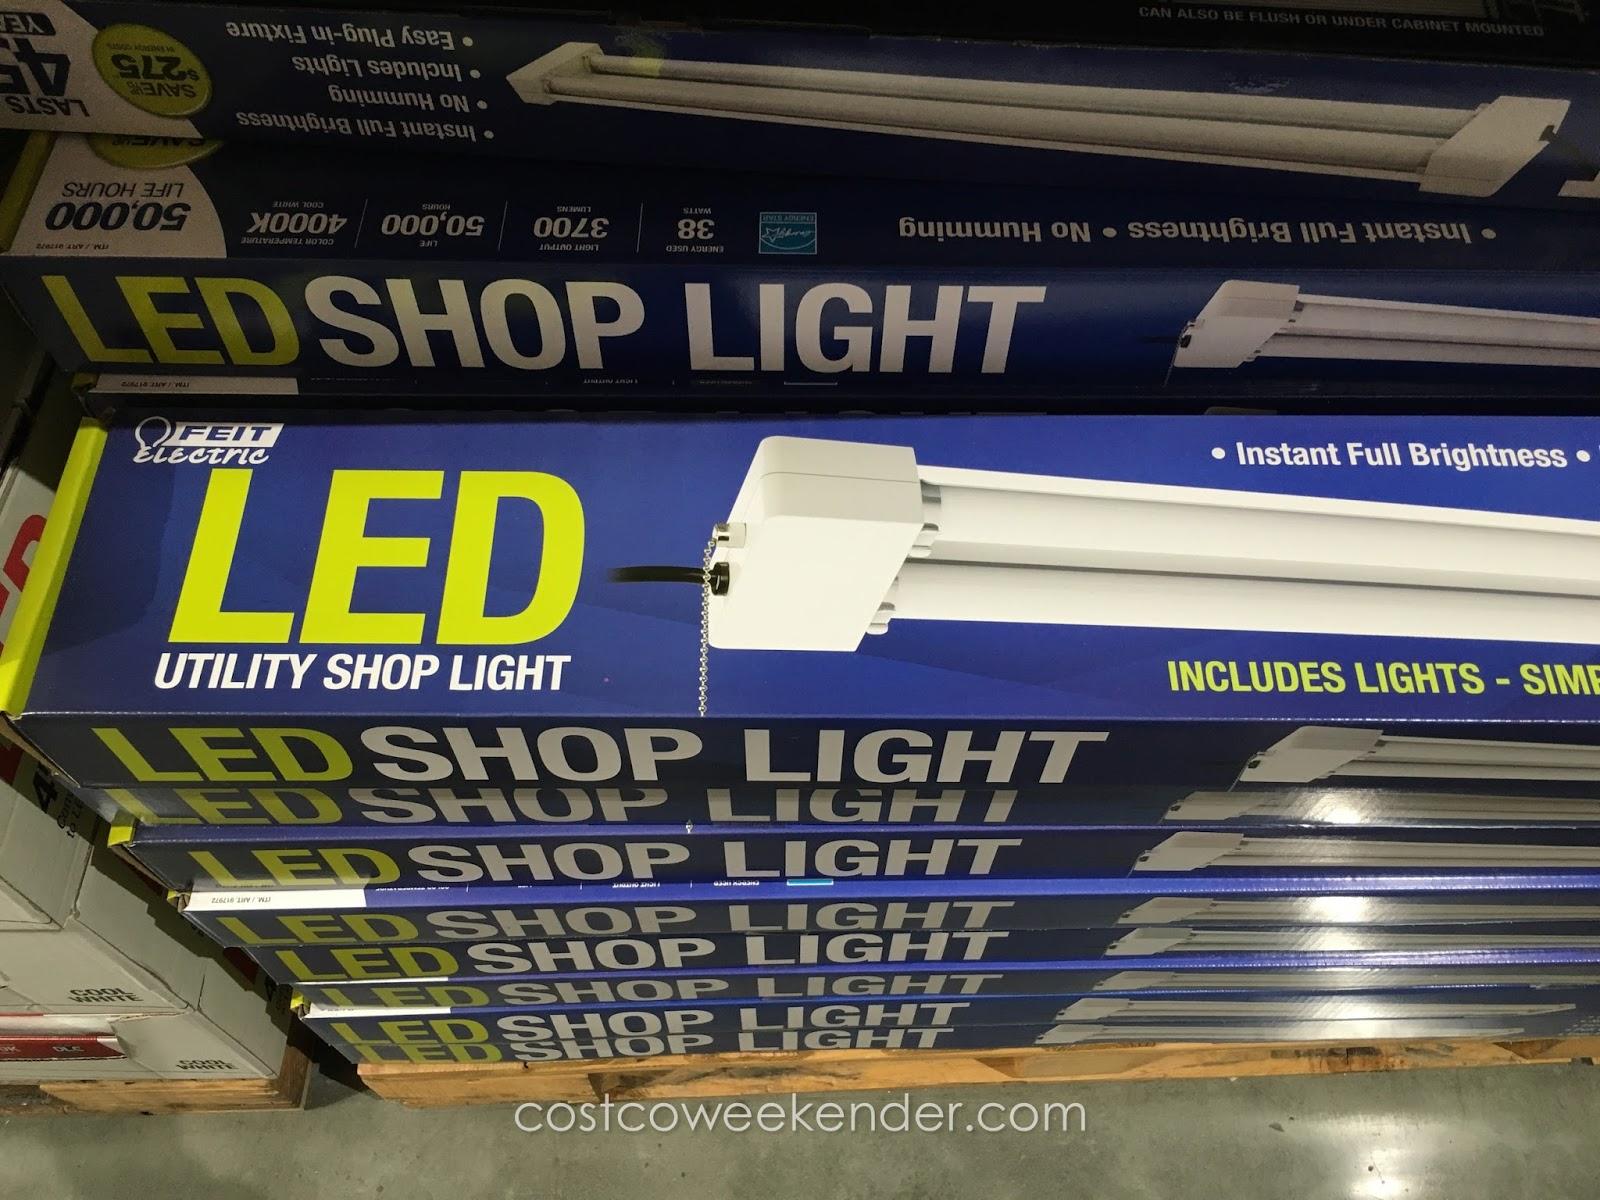 feit electric led utility shop light costco weekender. Black Bedroom Furniture Sets. Home Design Ideas